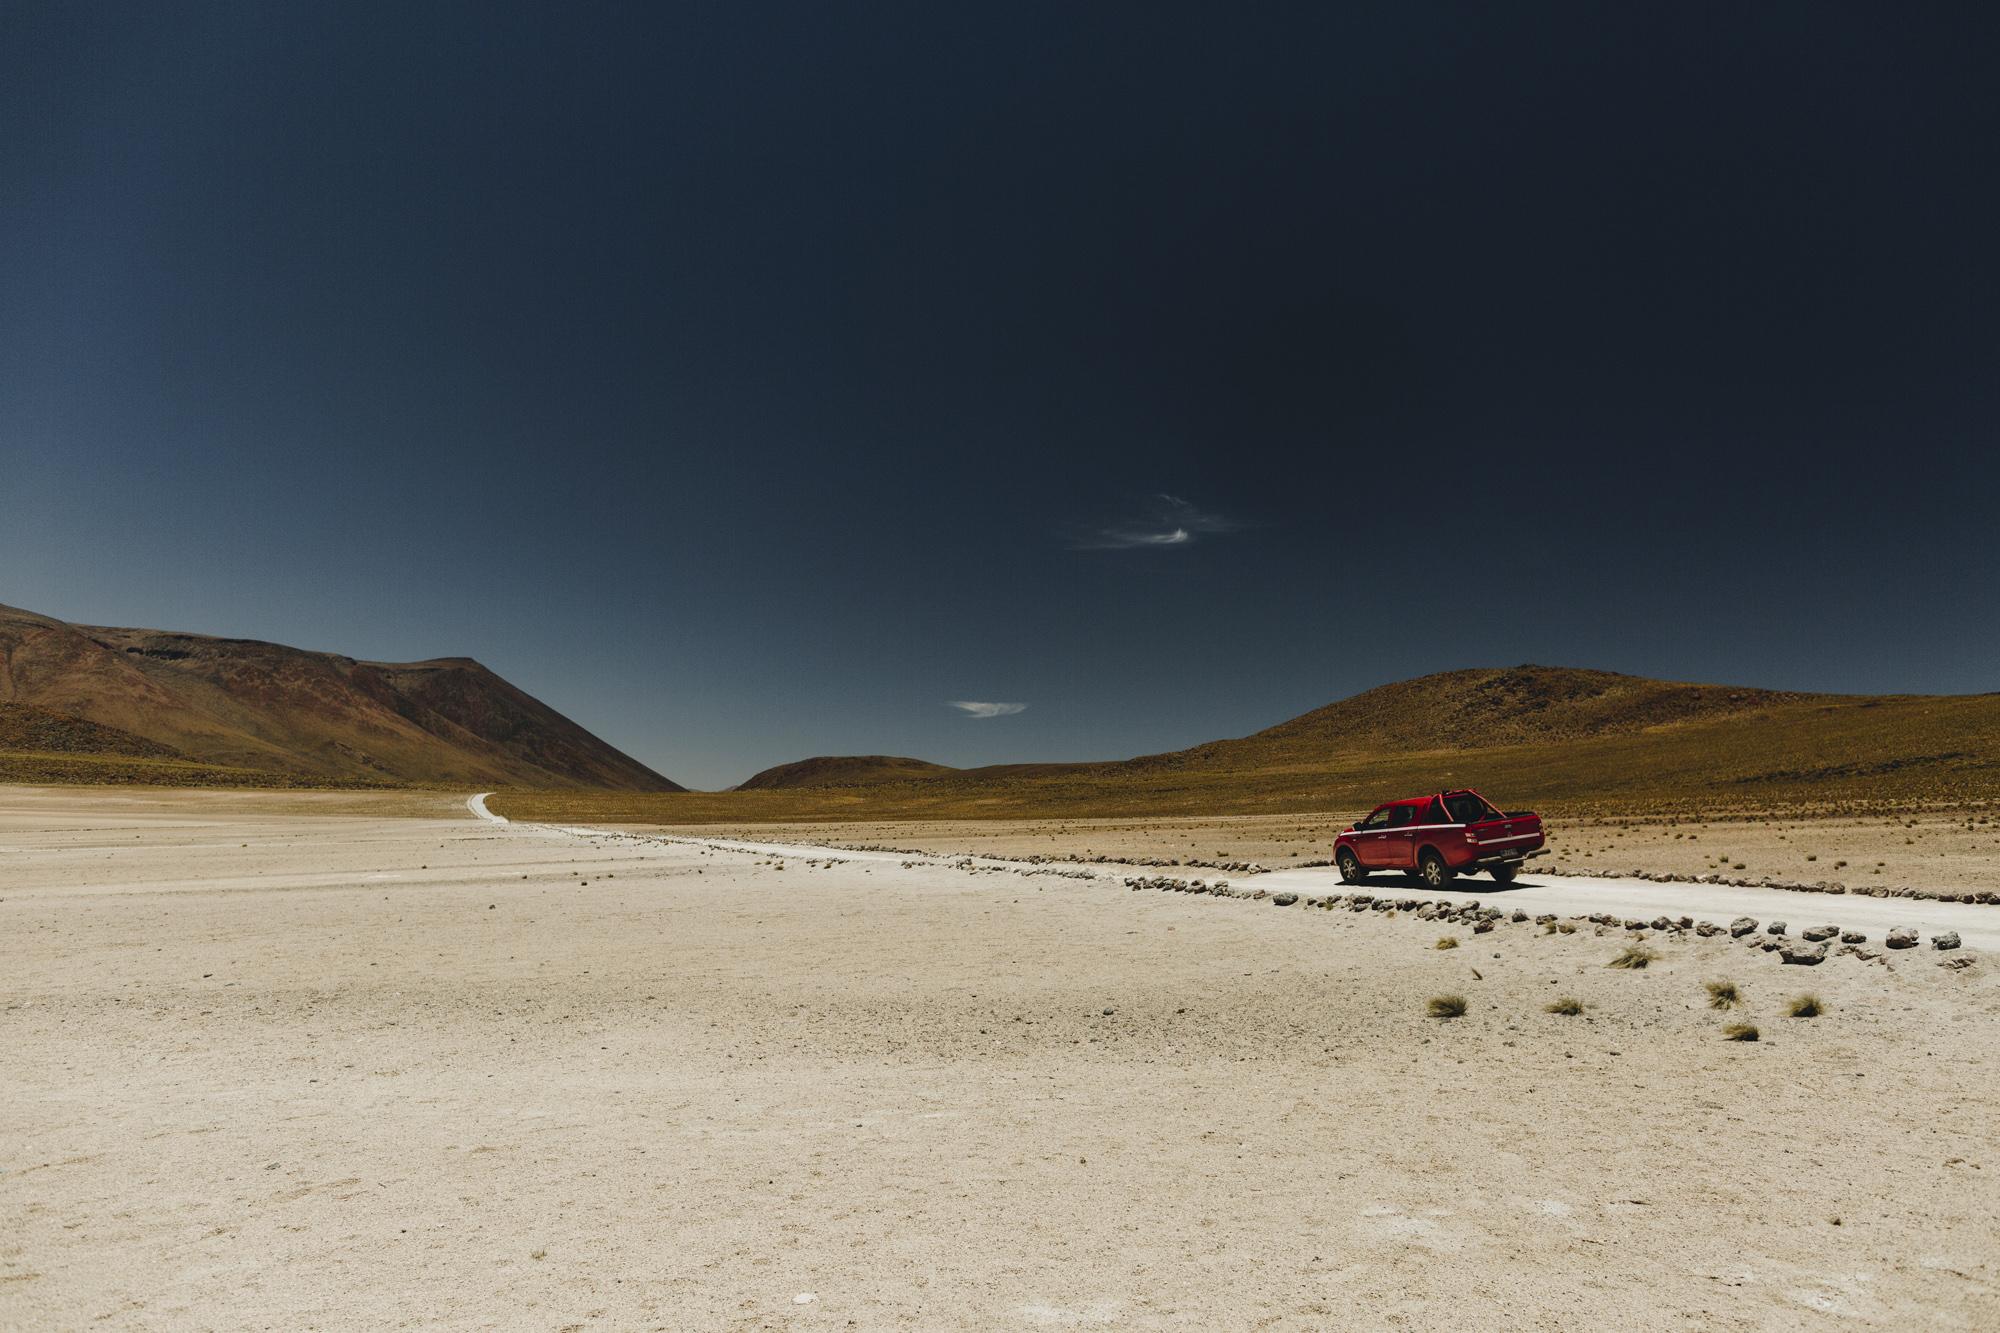 Mael Lambla photographer Chile San pedro atacama desert-237.jpg